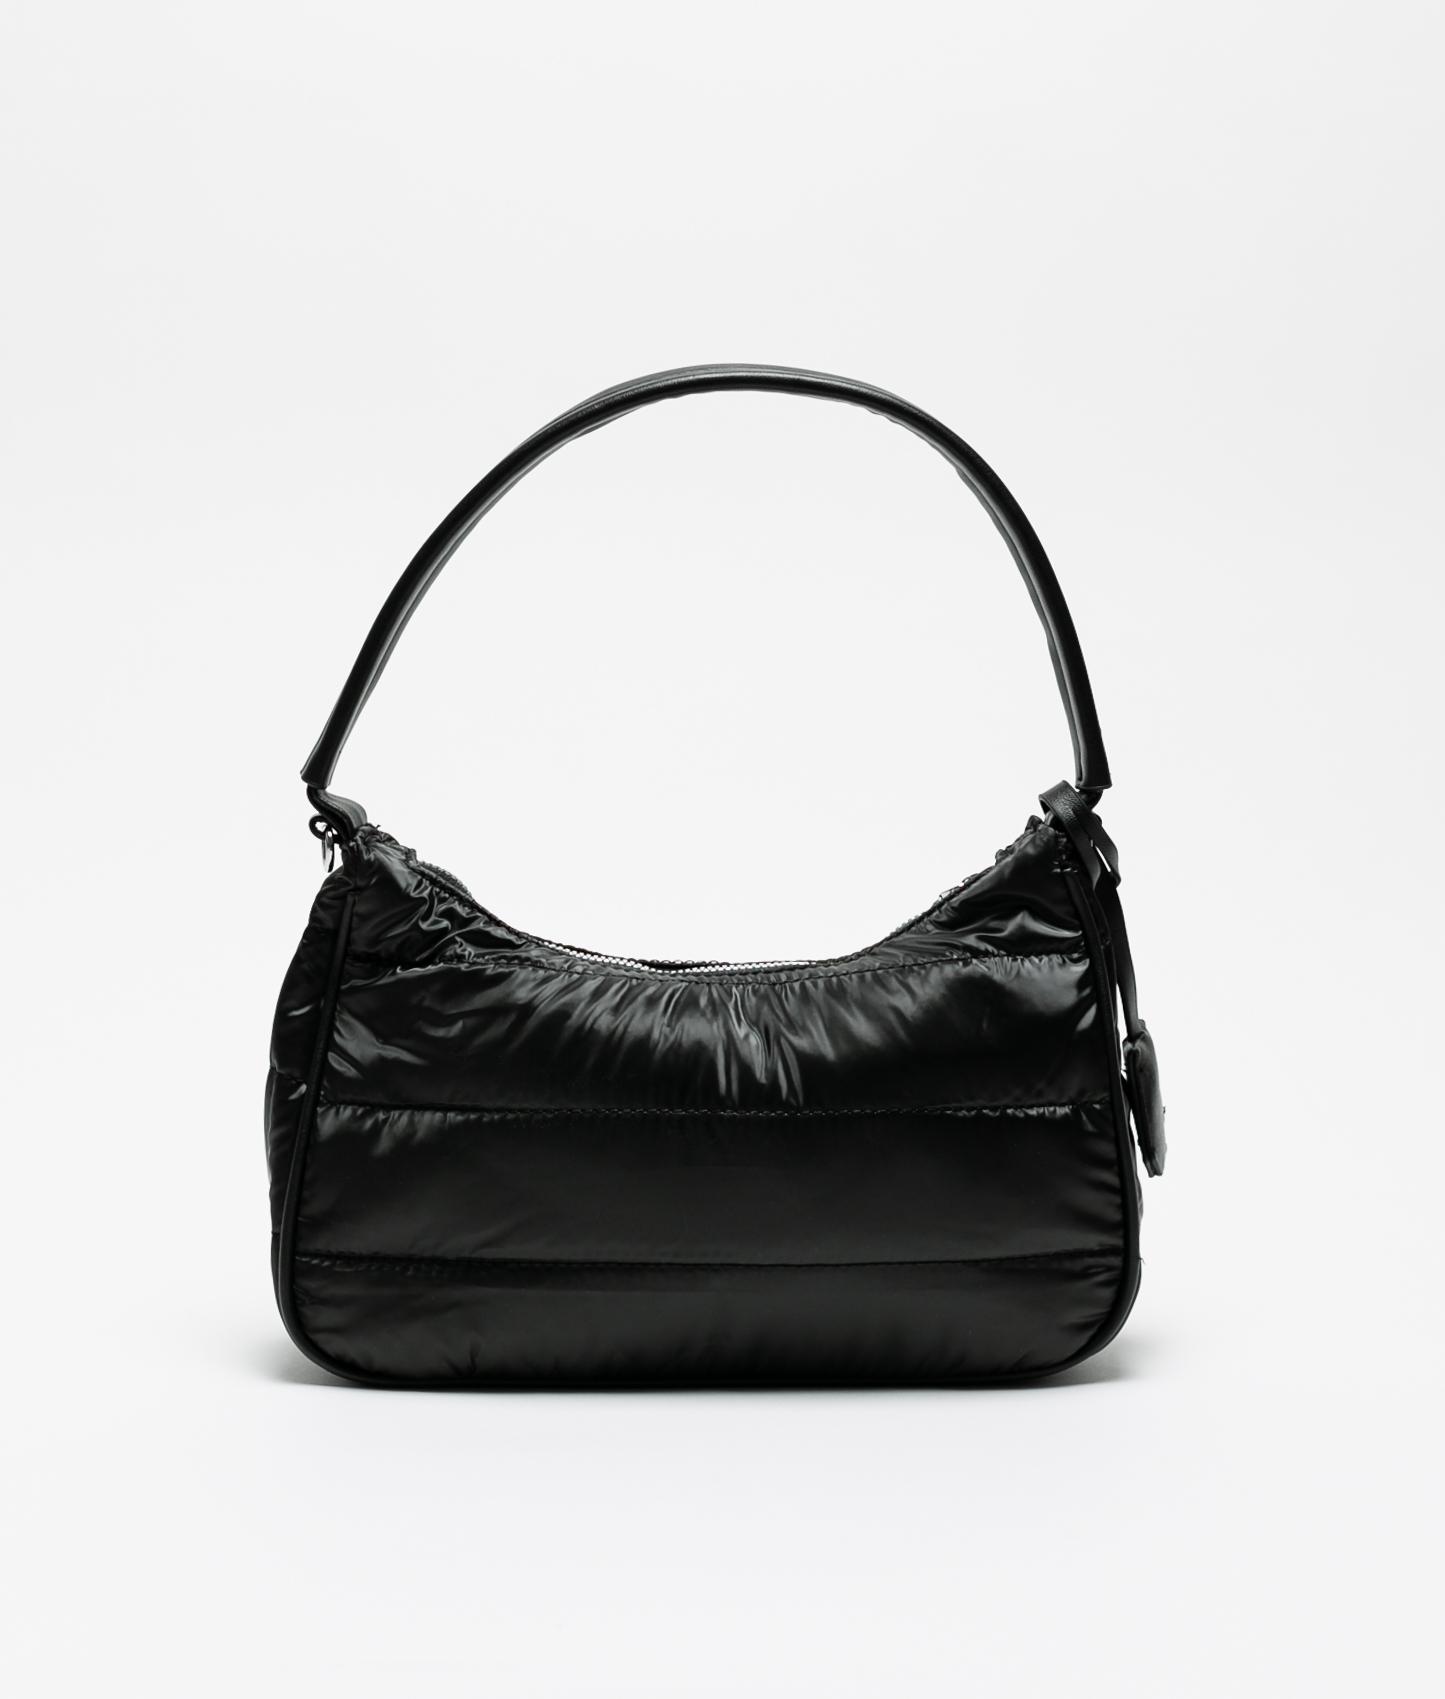 gerosa bag - black